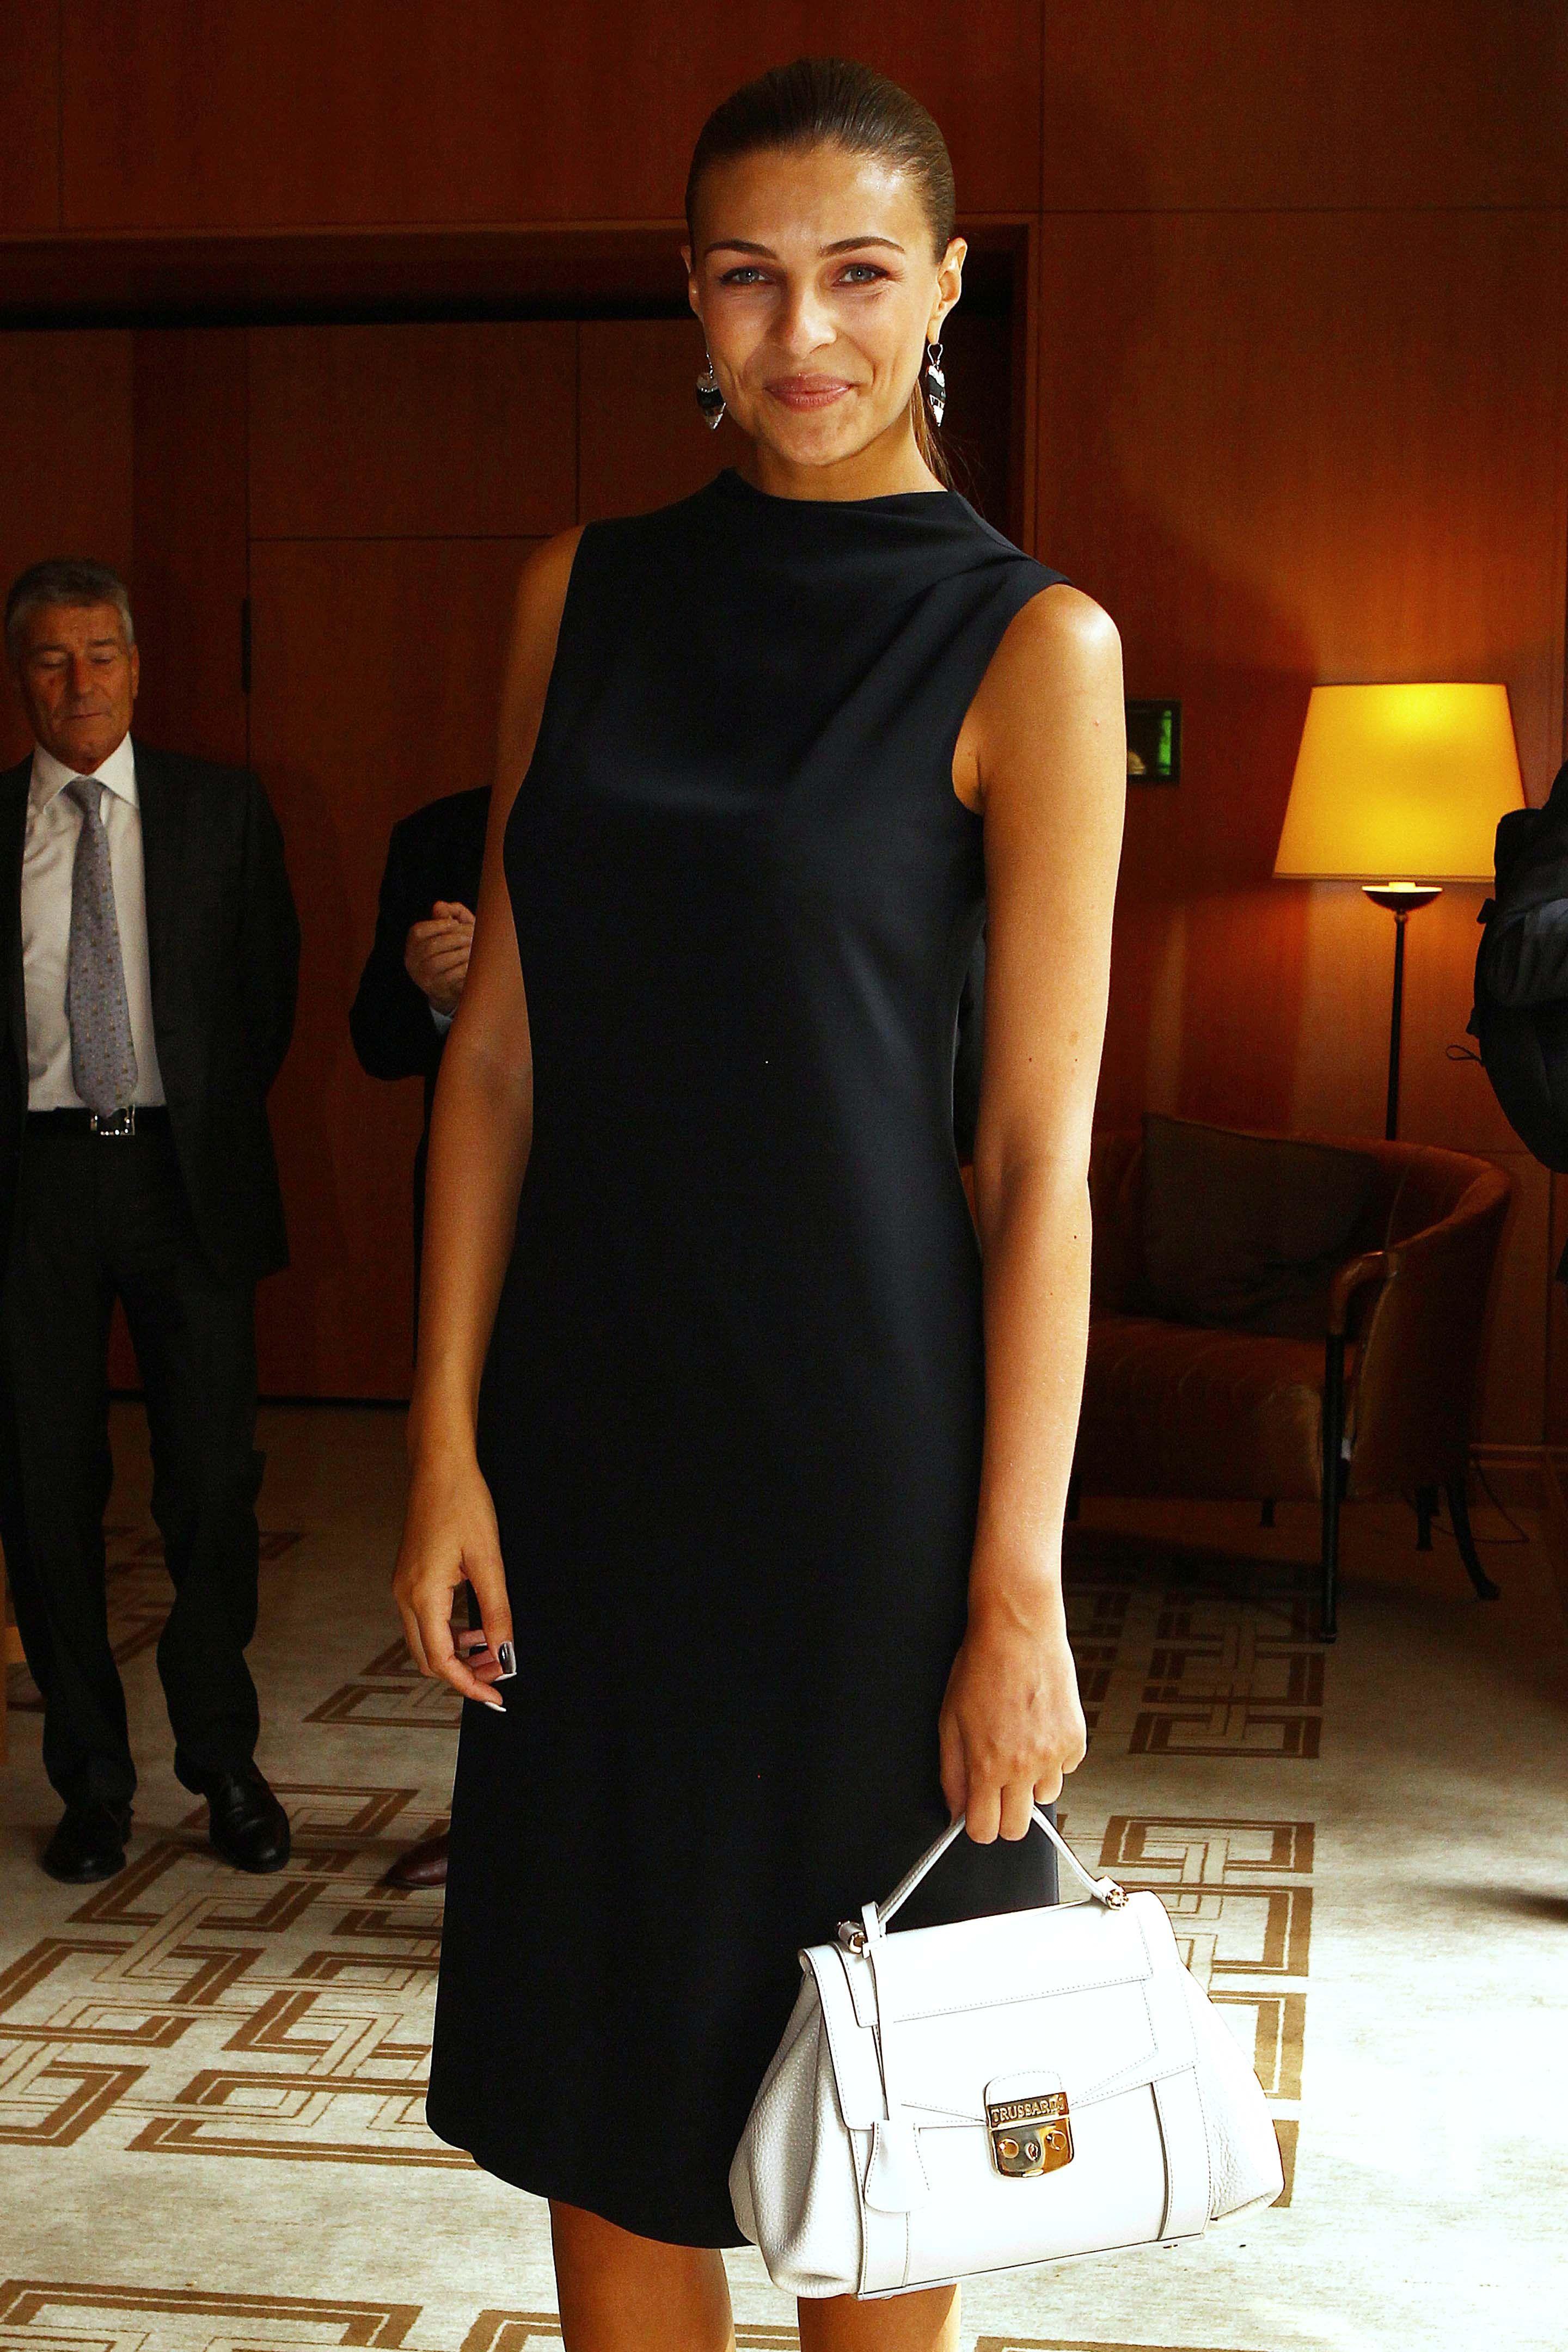 Cristina chiabotto celebrities in trussardi pinterest moda boutique and celebrity Celebrity style fashion boutique